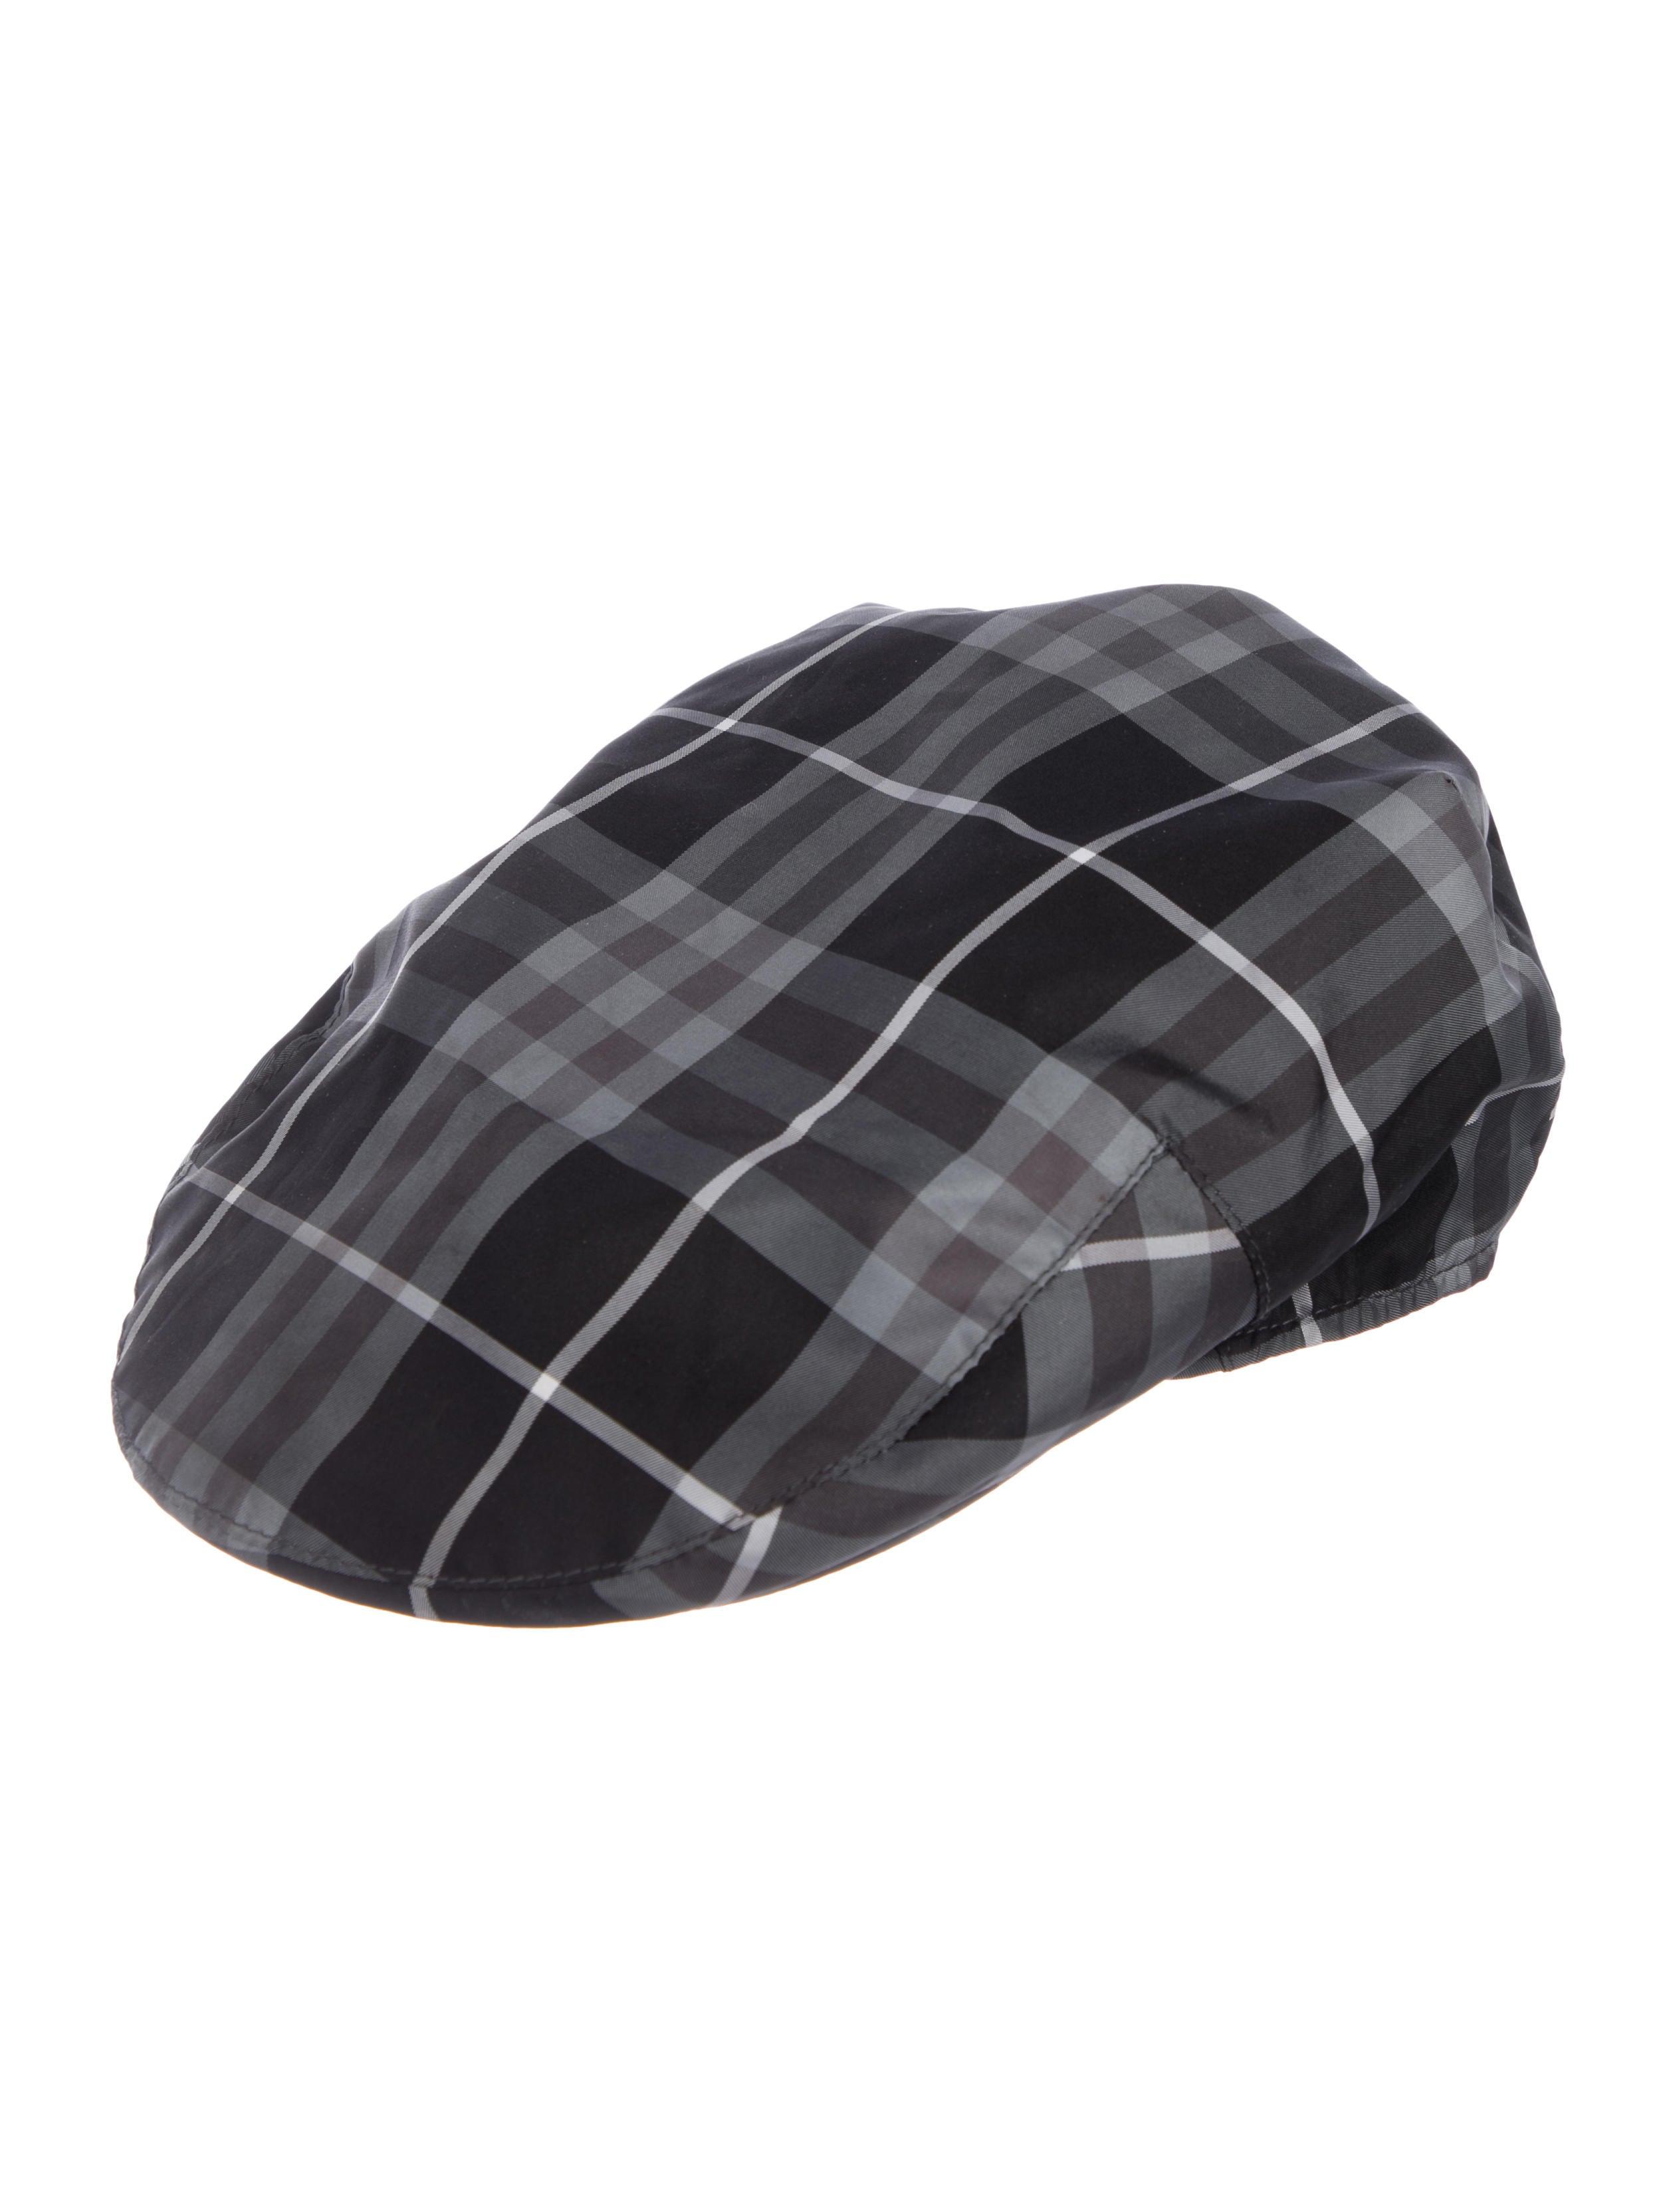 2c6a934f299 Burberry London Beat Check Newsboy Hat - Accessories - WBURL41902 ...